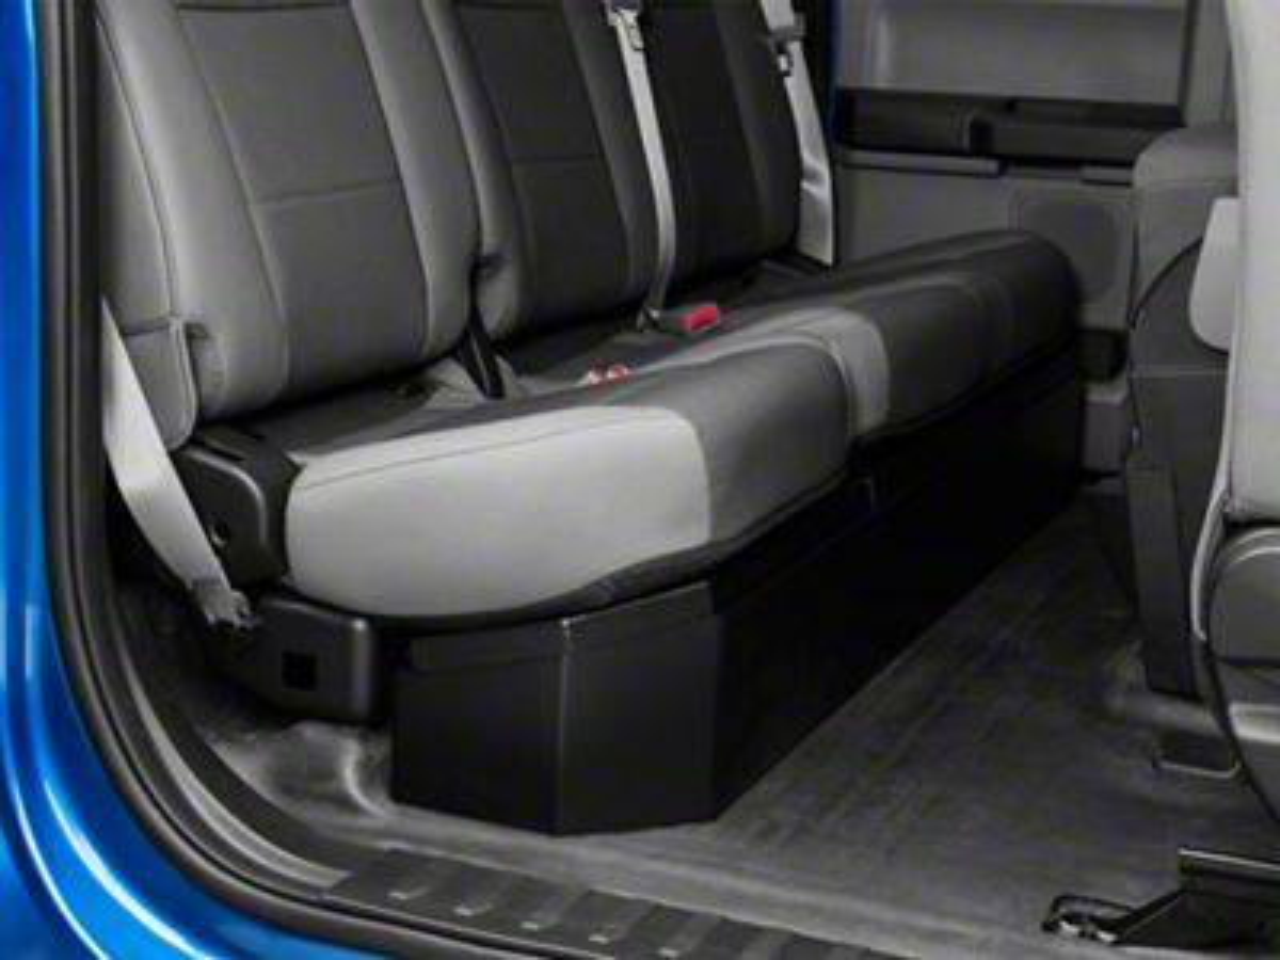 Tuffy Under Rear Seat Lockbox (15-19 F-150 SuperCrew)